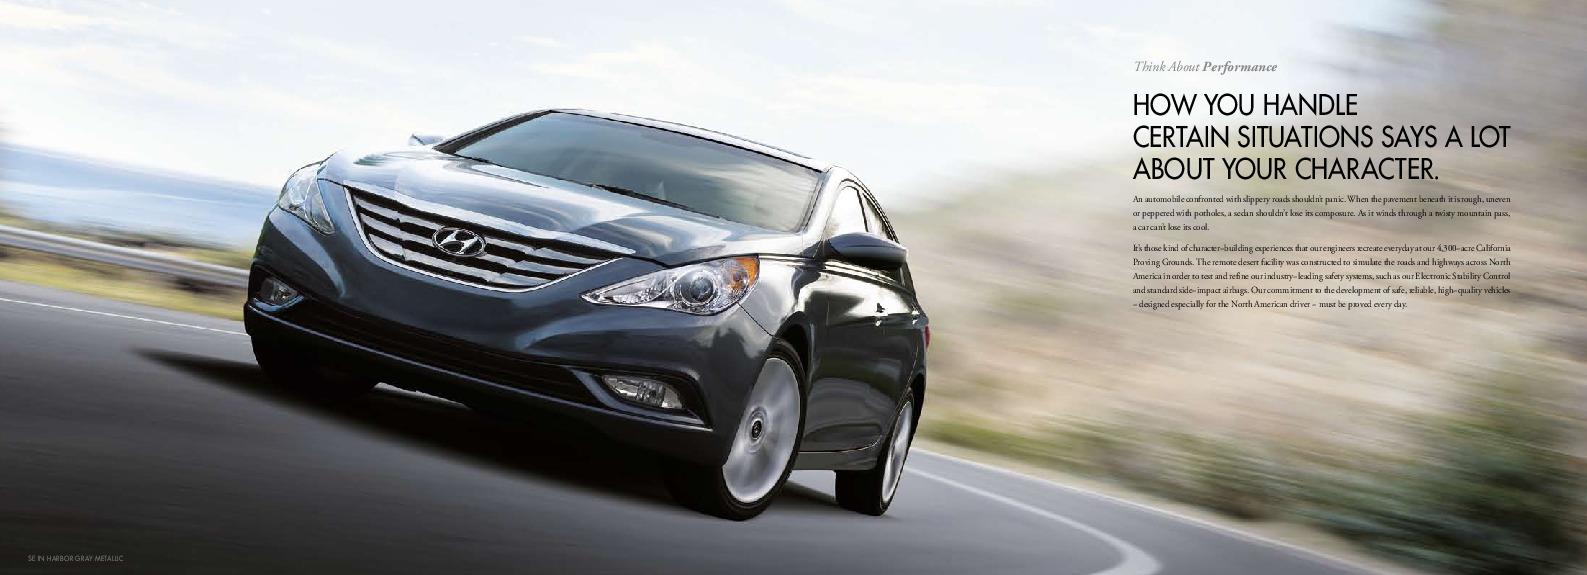 2011 hyundai sonata 2 4l gls se limited hyundai i45 catalogue brochure rh auto filemanual com Hyundai Genesis Hyundai I40 Sedan